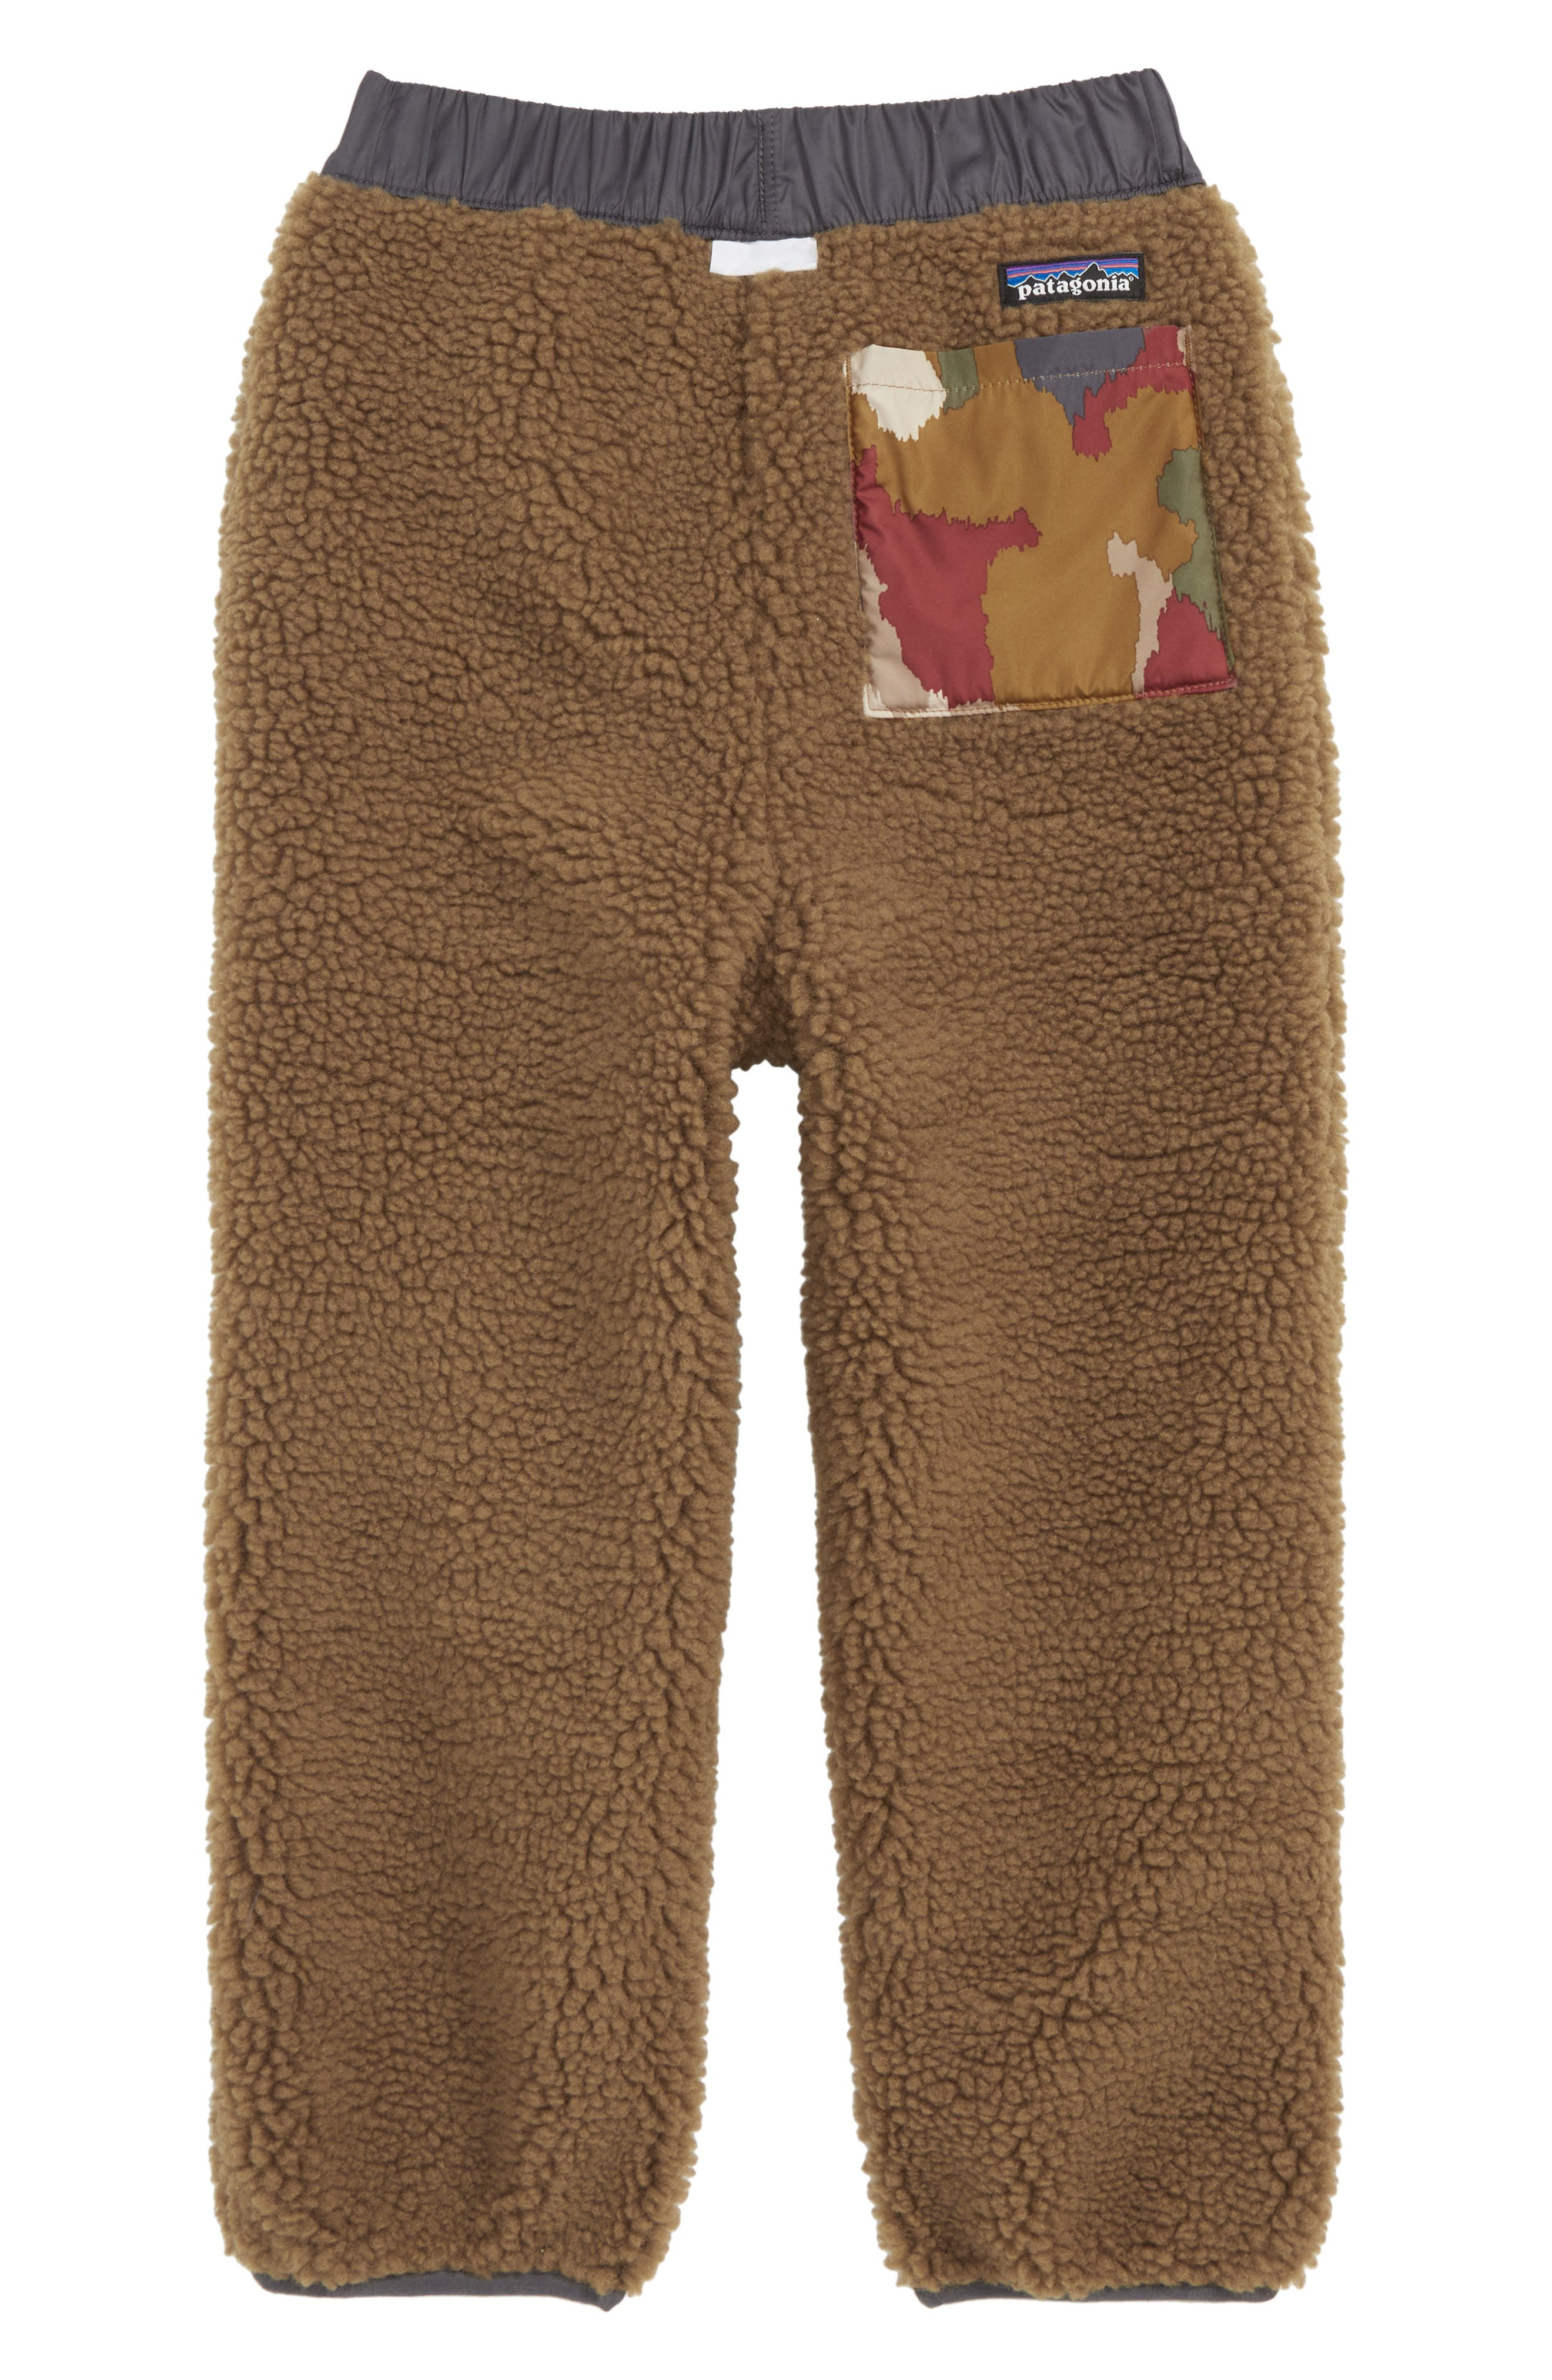 PATAGONIA, Tribbles Reversible Water Repellent Snow Pants, Alternate thumbnail 2, color, 200